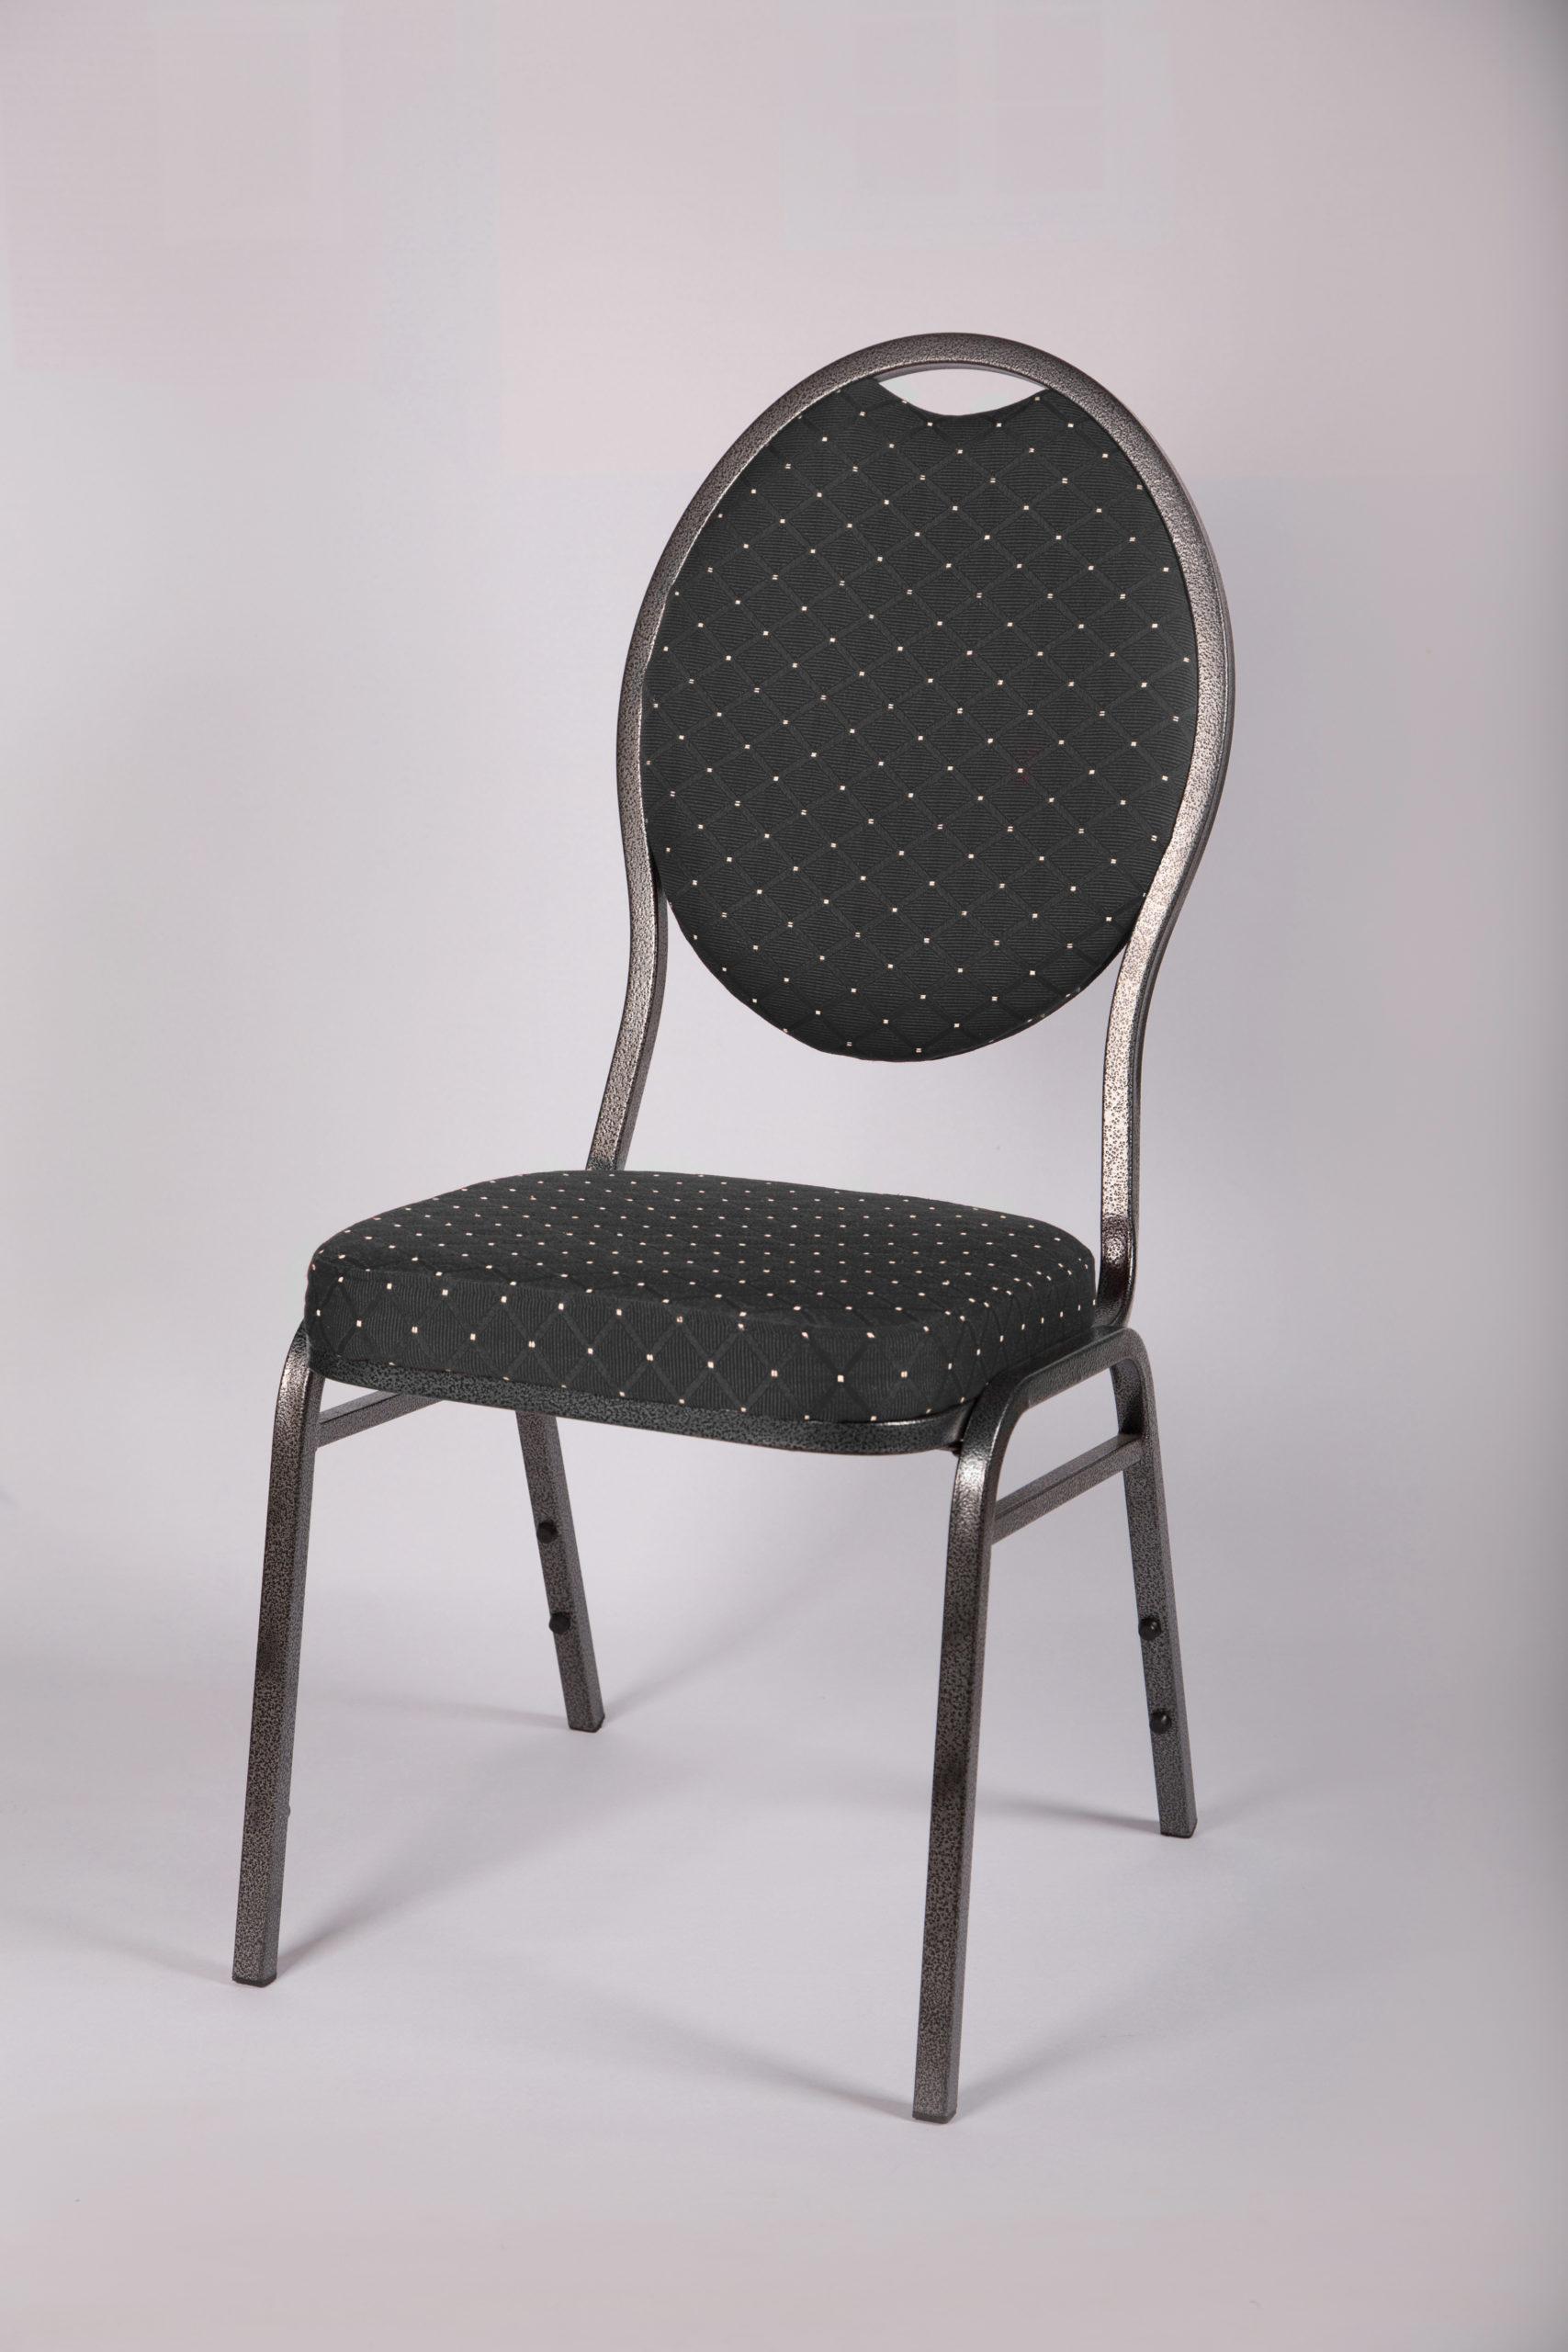 Bankettstuhl Stuhl gepolstert schwarz